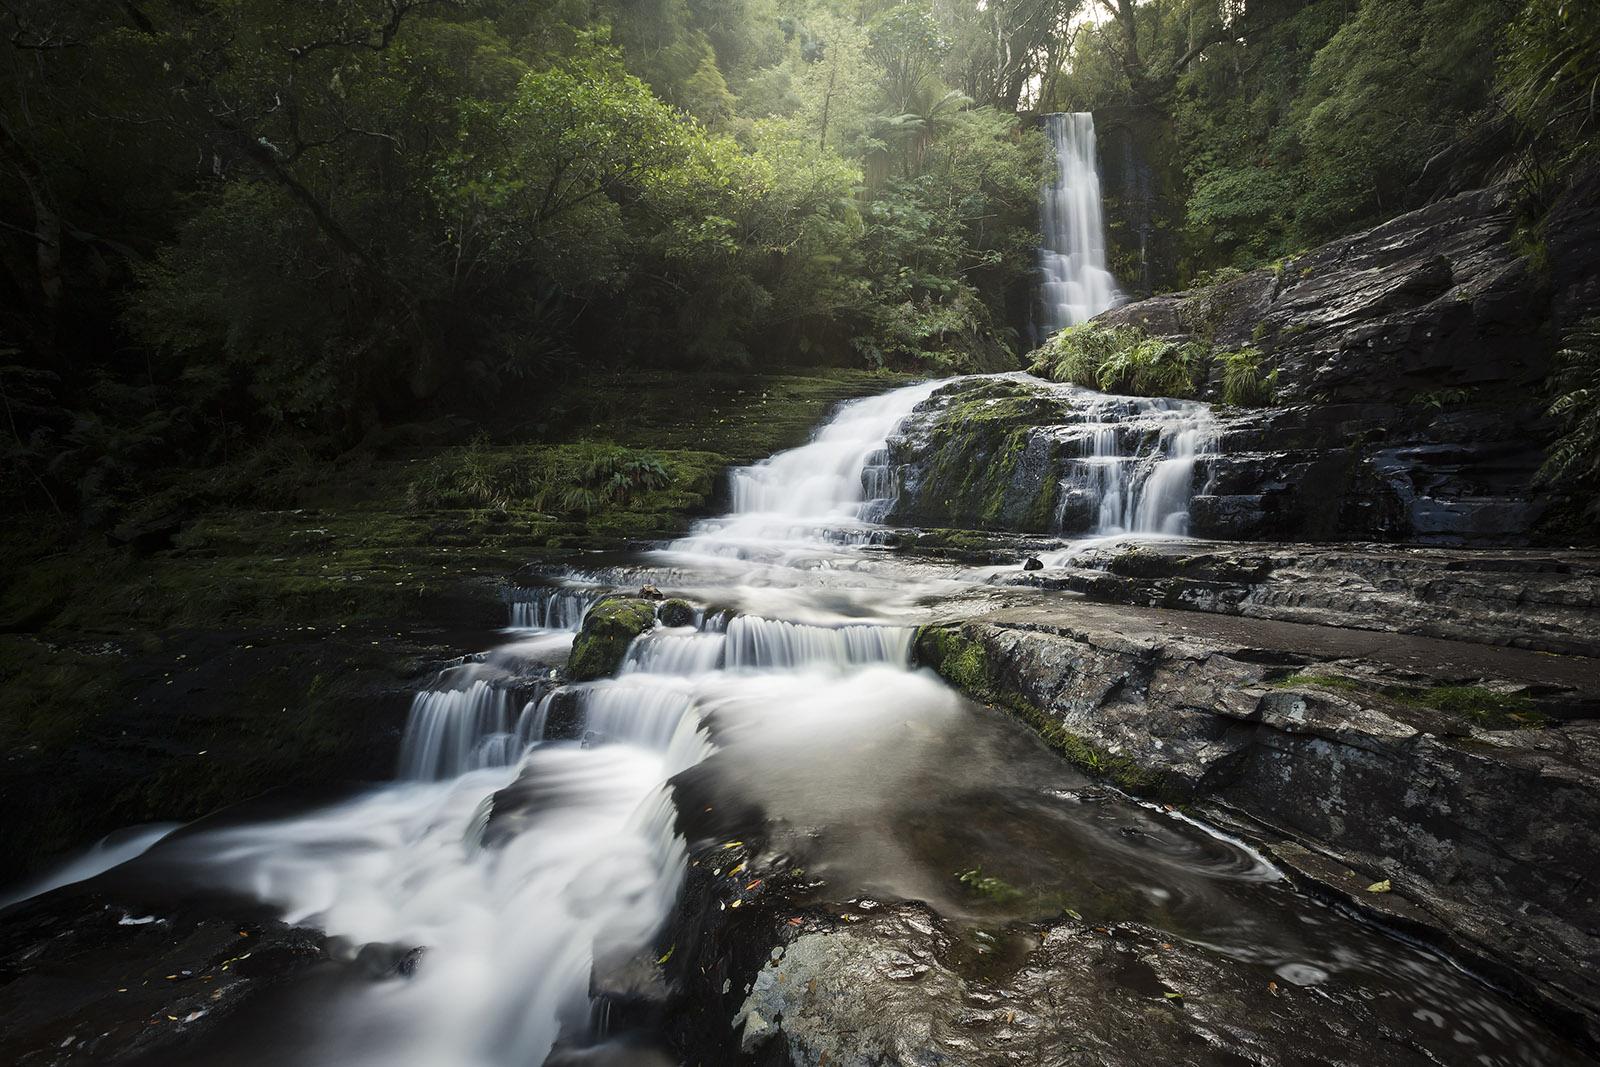 mcleans-falls-catlins-forest-park-nouvelle-zelande-new-zealand-landscape-paysage-cascade-waterfall-south-island-ile-sud-elise-julliard-photographe-photographer-southland-otago